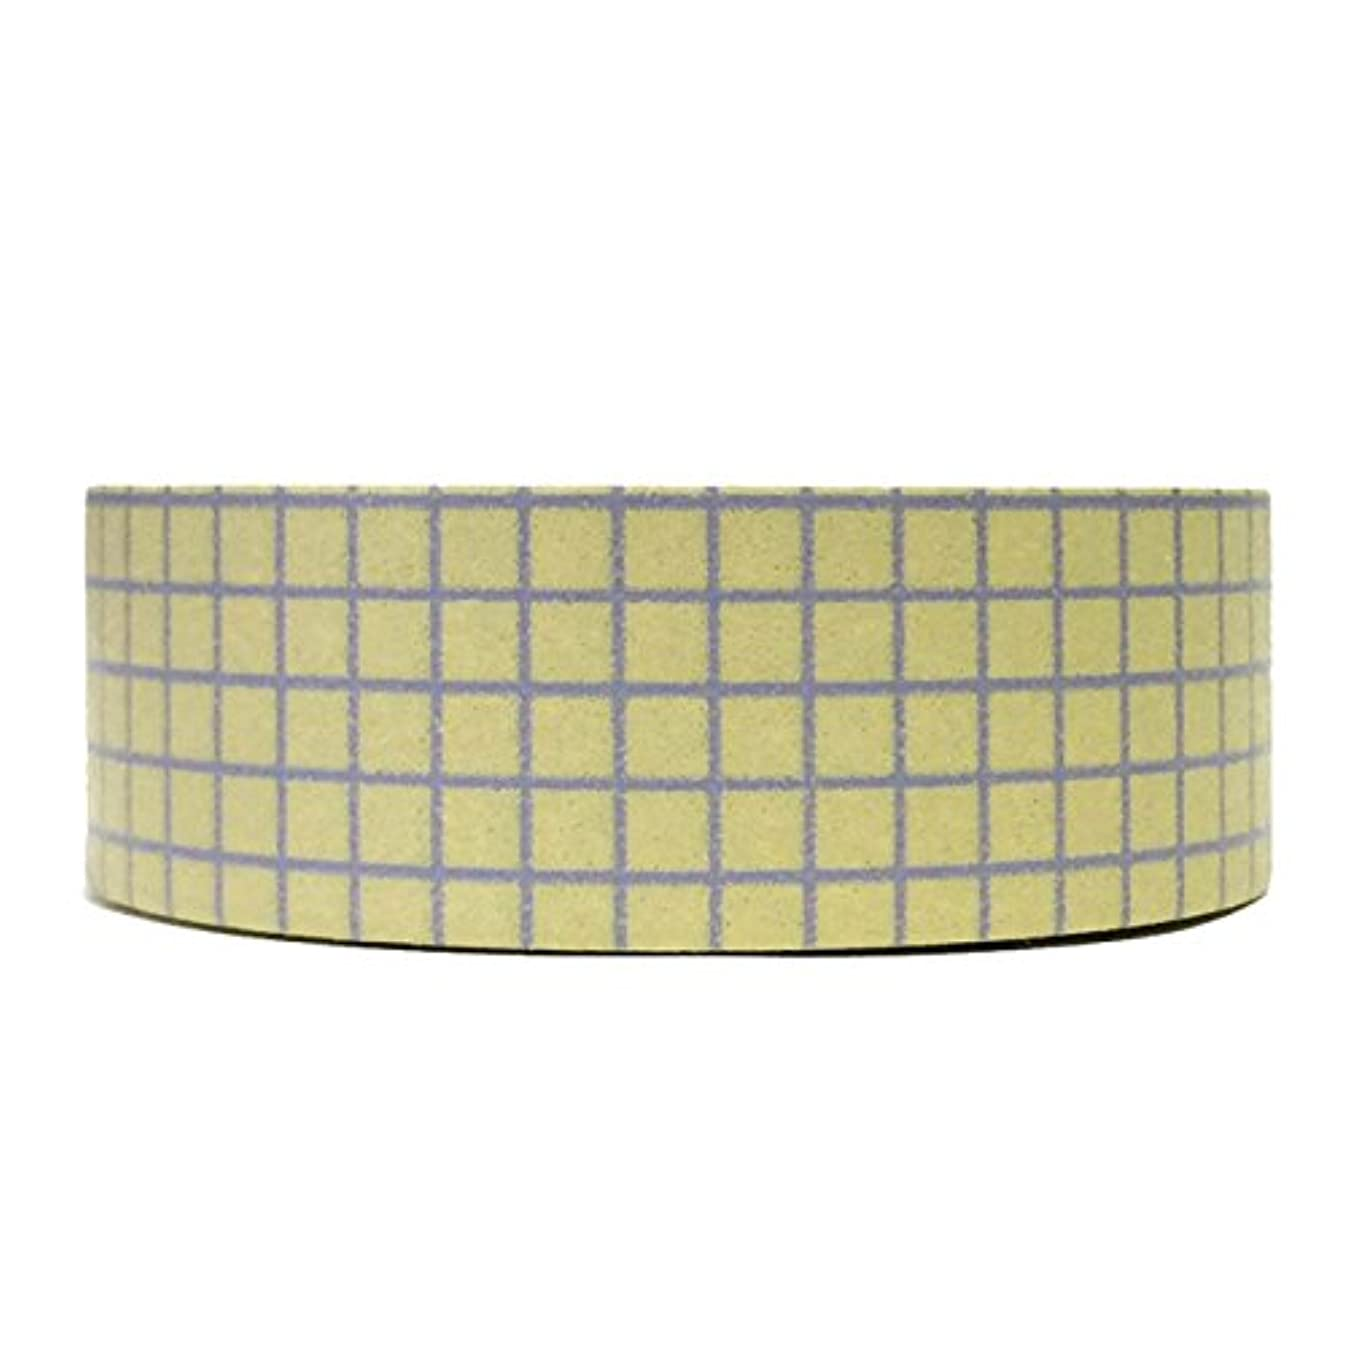 Wrapables Colorful Patterns Washi Masking Tape, Lavender Gingham